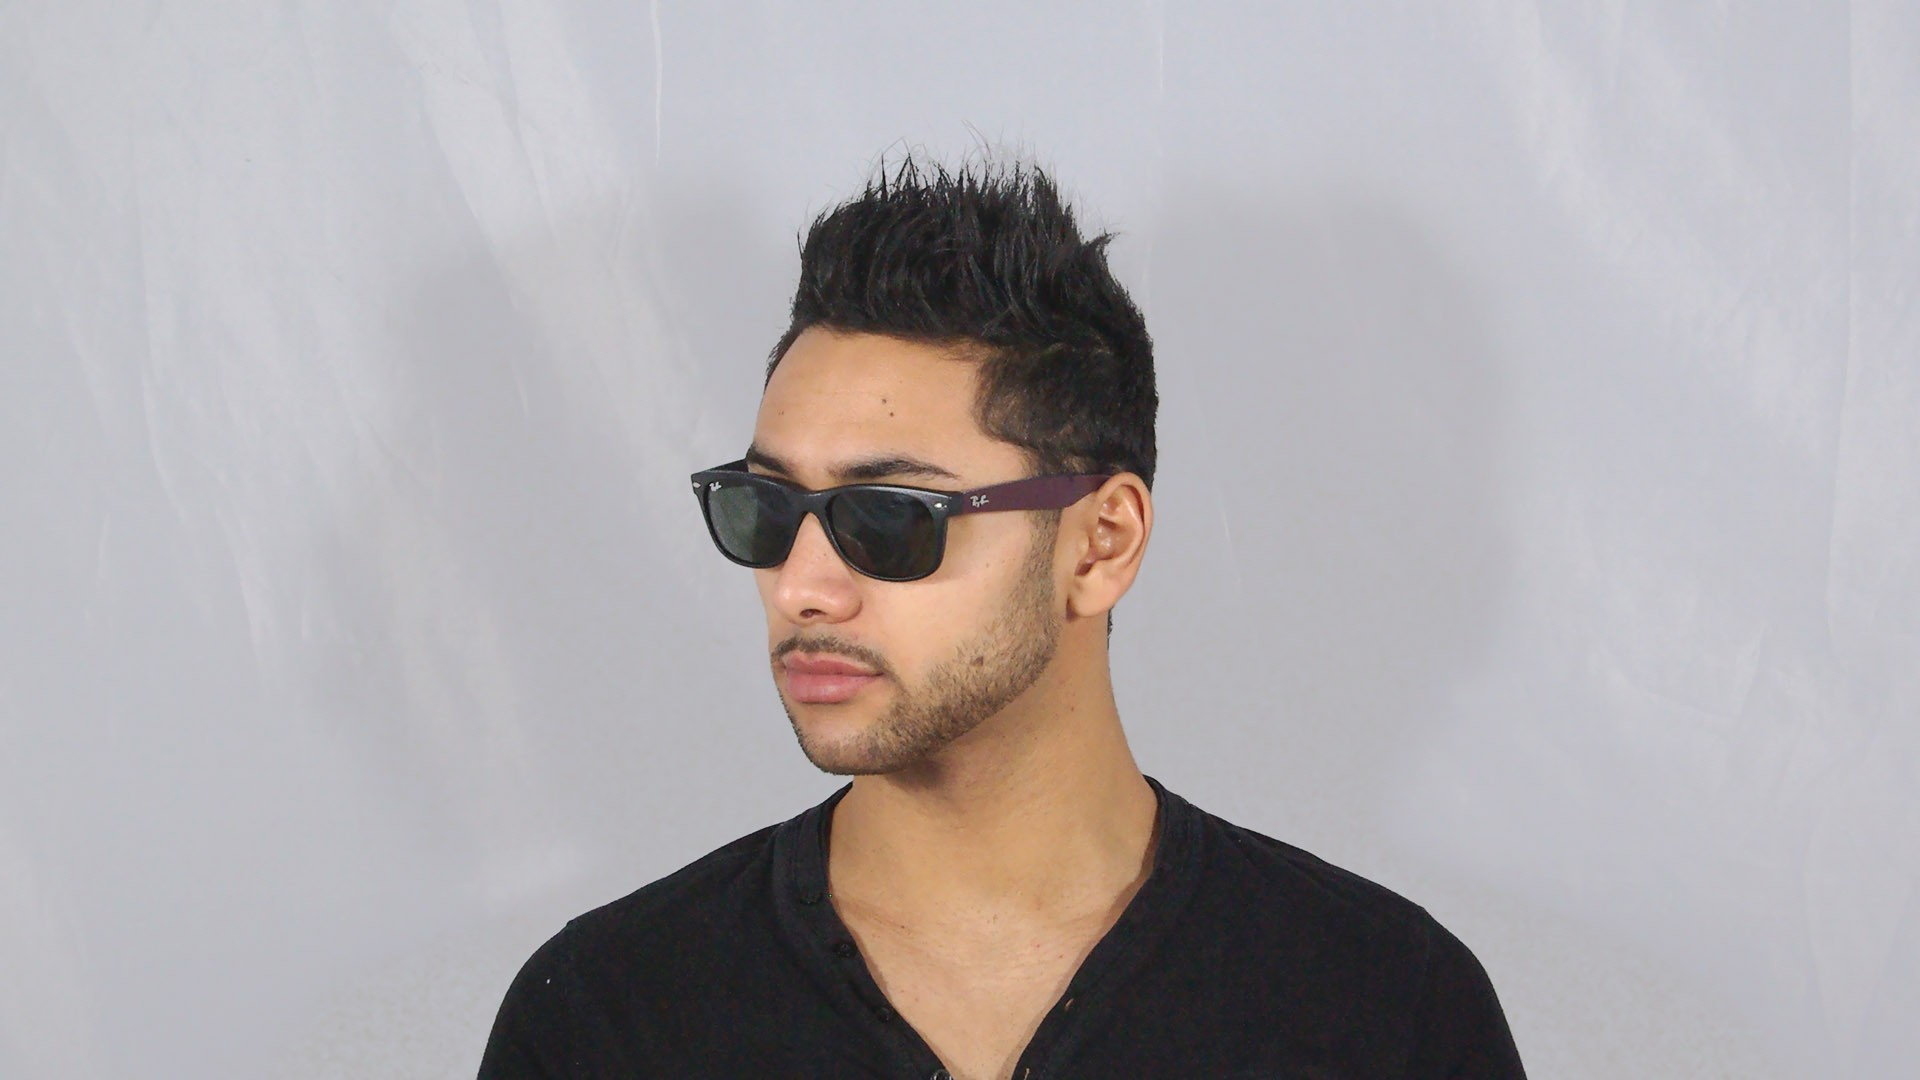 1c67410961503 Ray Ban Rb2132 New Wayfarer 622 3n Sunglasses « Heritage Malta